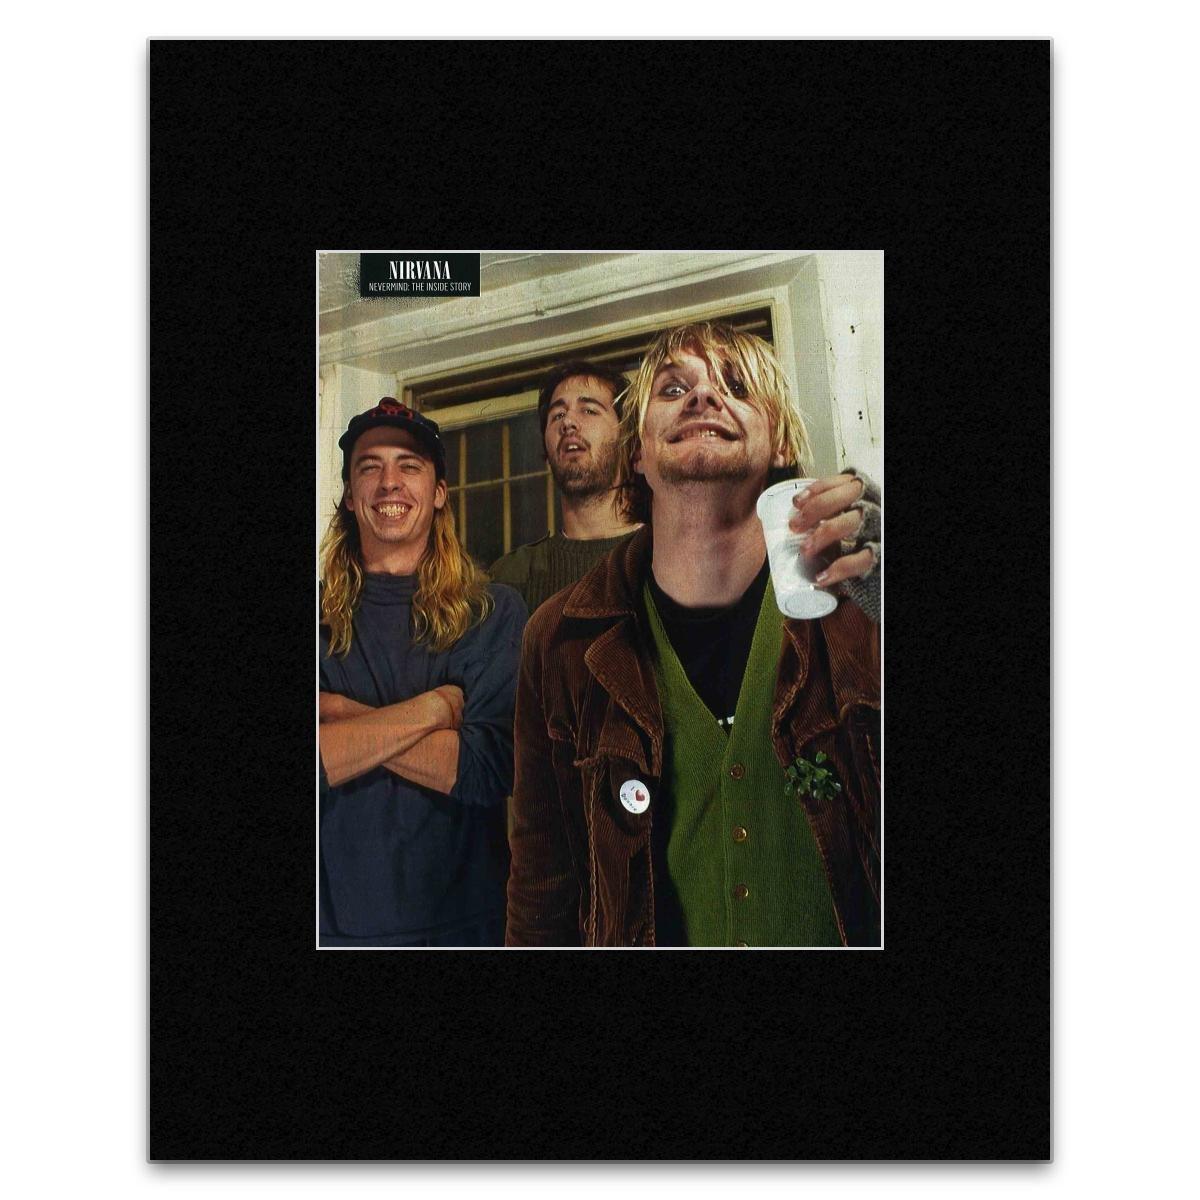 Amazon.de: NIRVANA-Dave Grohl Krist Novoselic und Kurt Cobain Poster ...